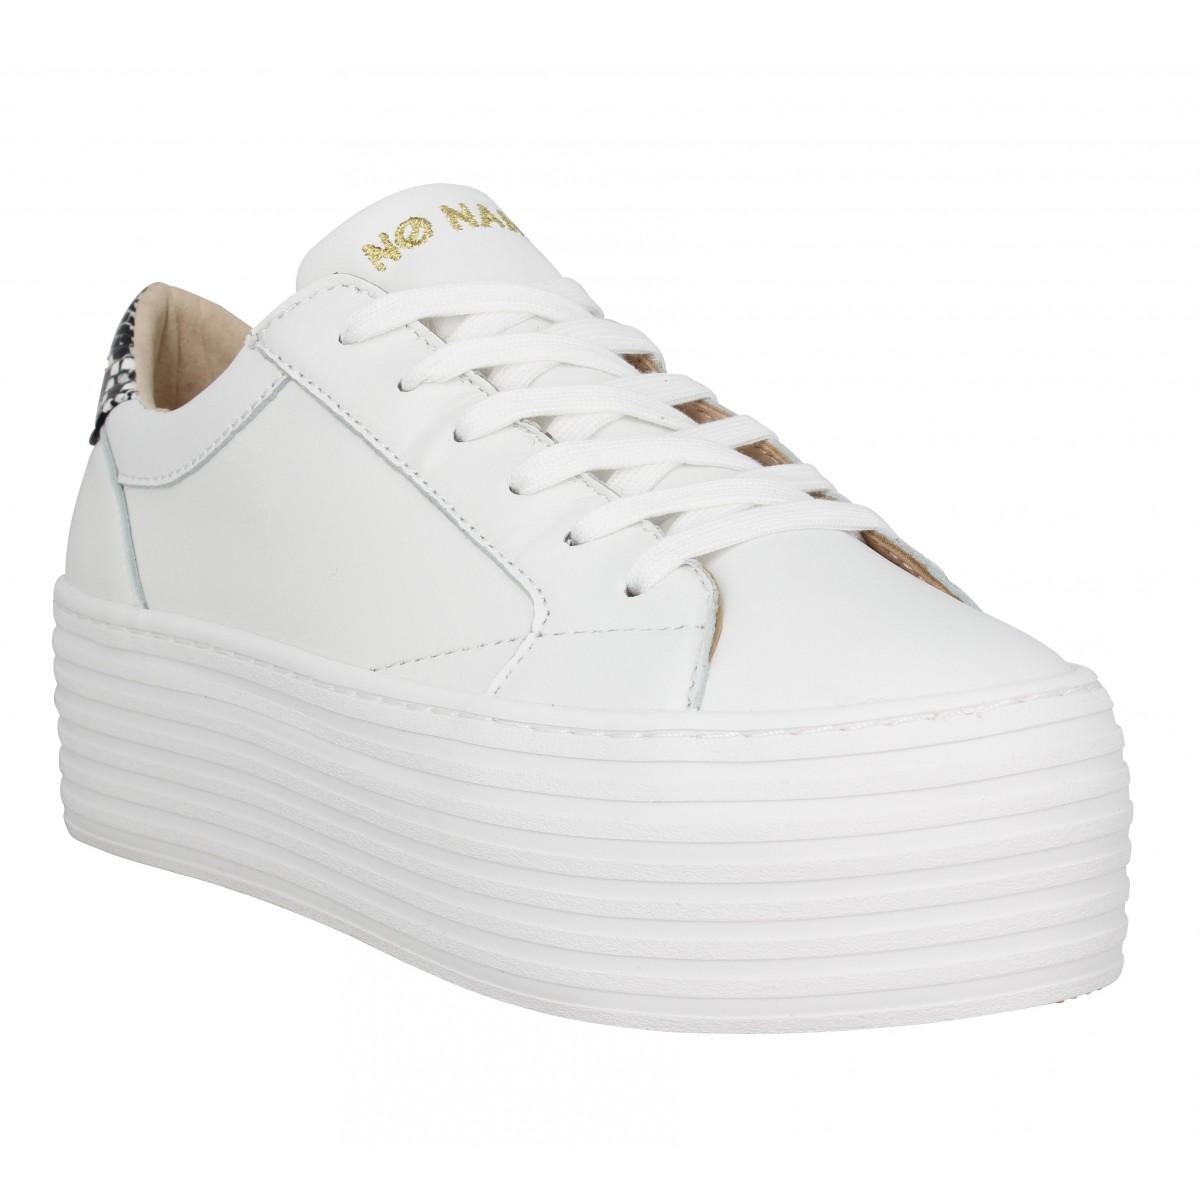 No Name Marque Spice Sneaker Cuir...